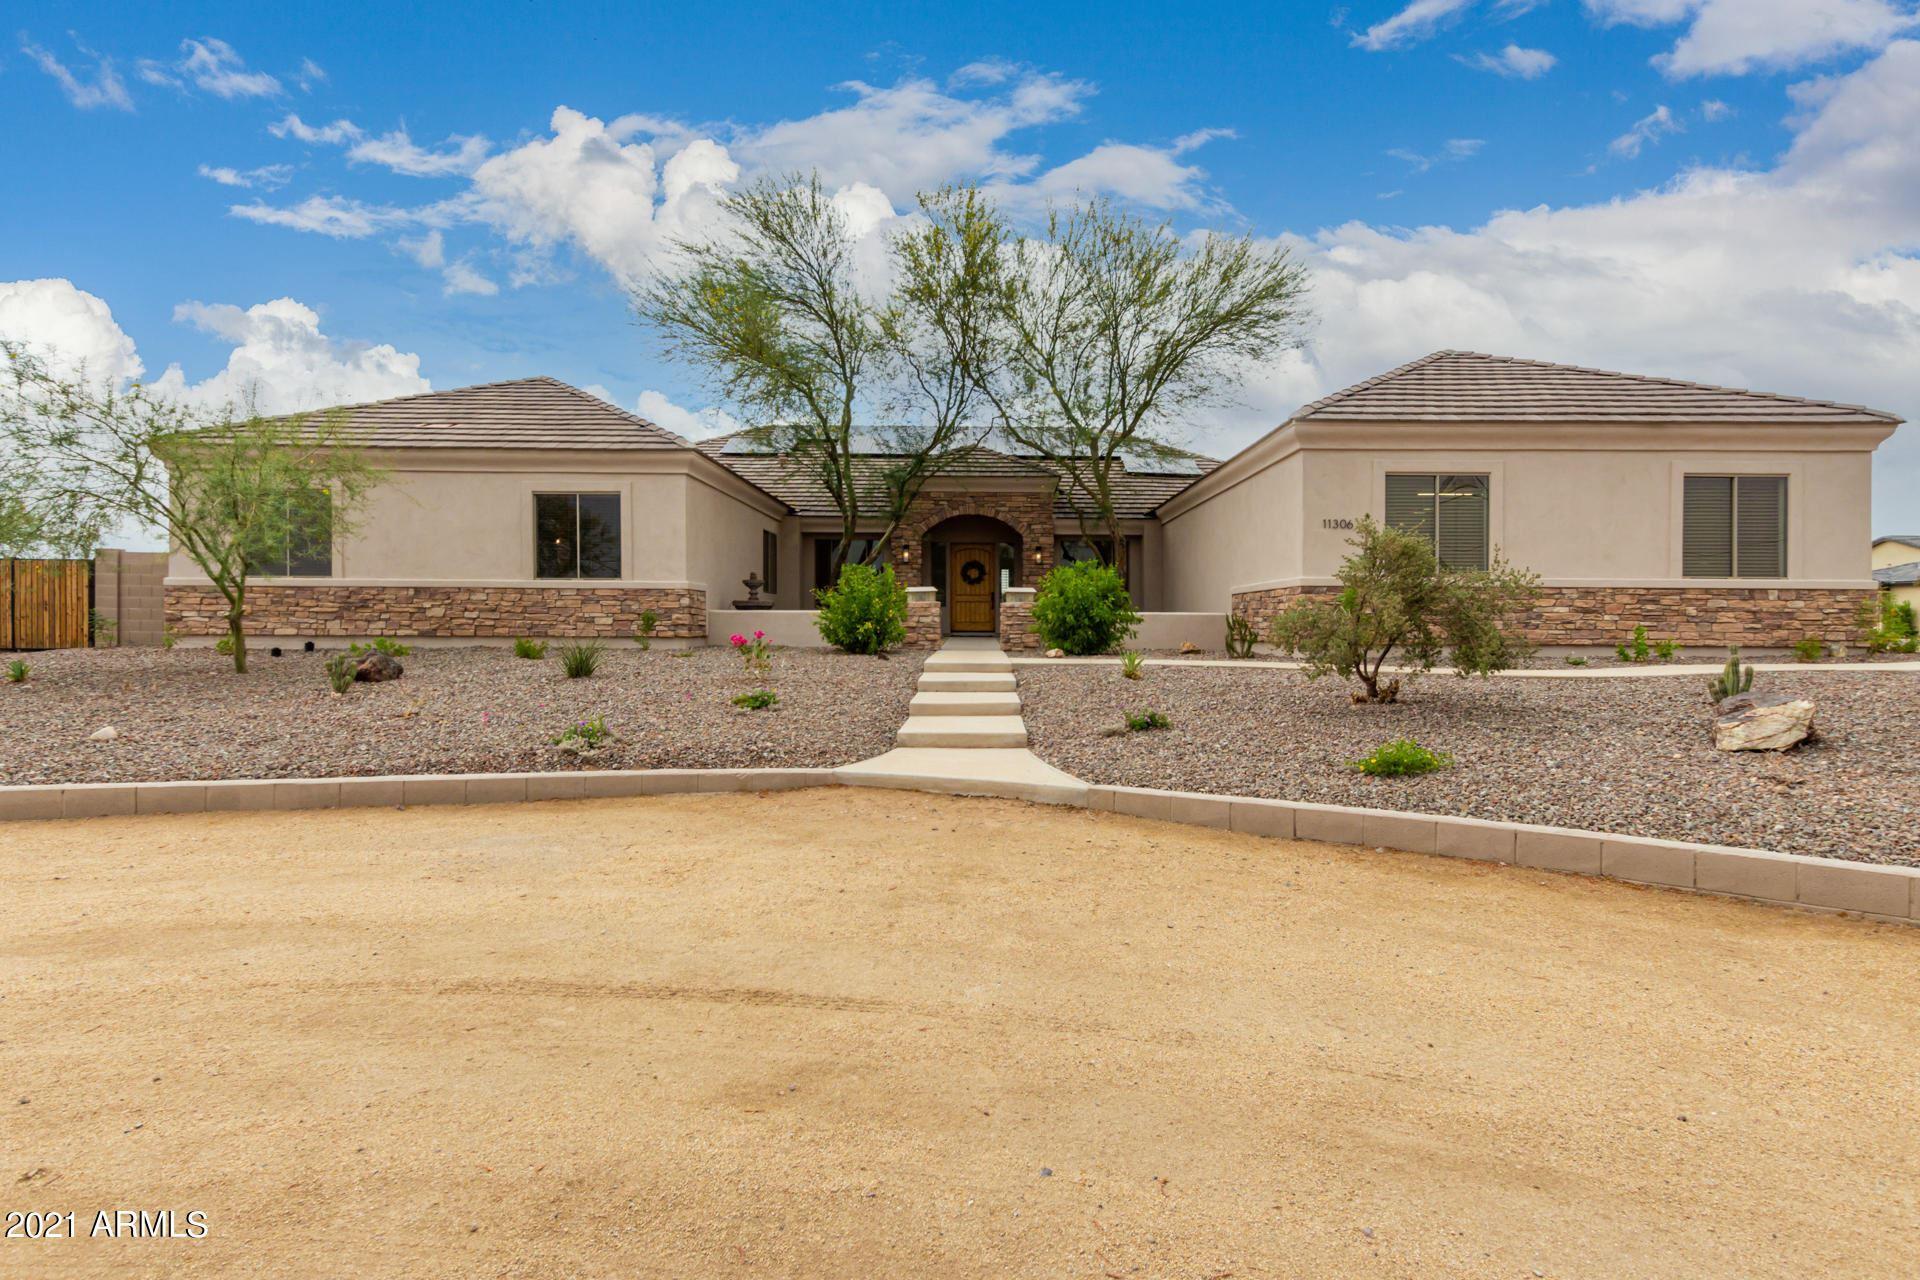 11306 W BRILES Road, Peoria, AZ 85383 - MLS#: 6252912